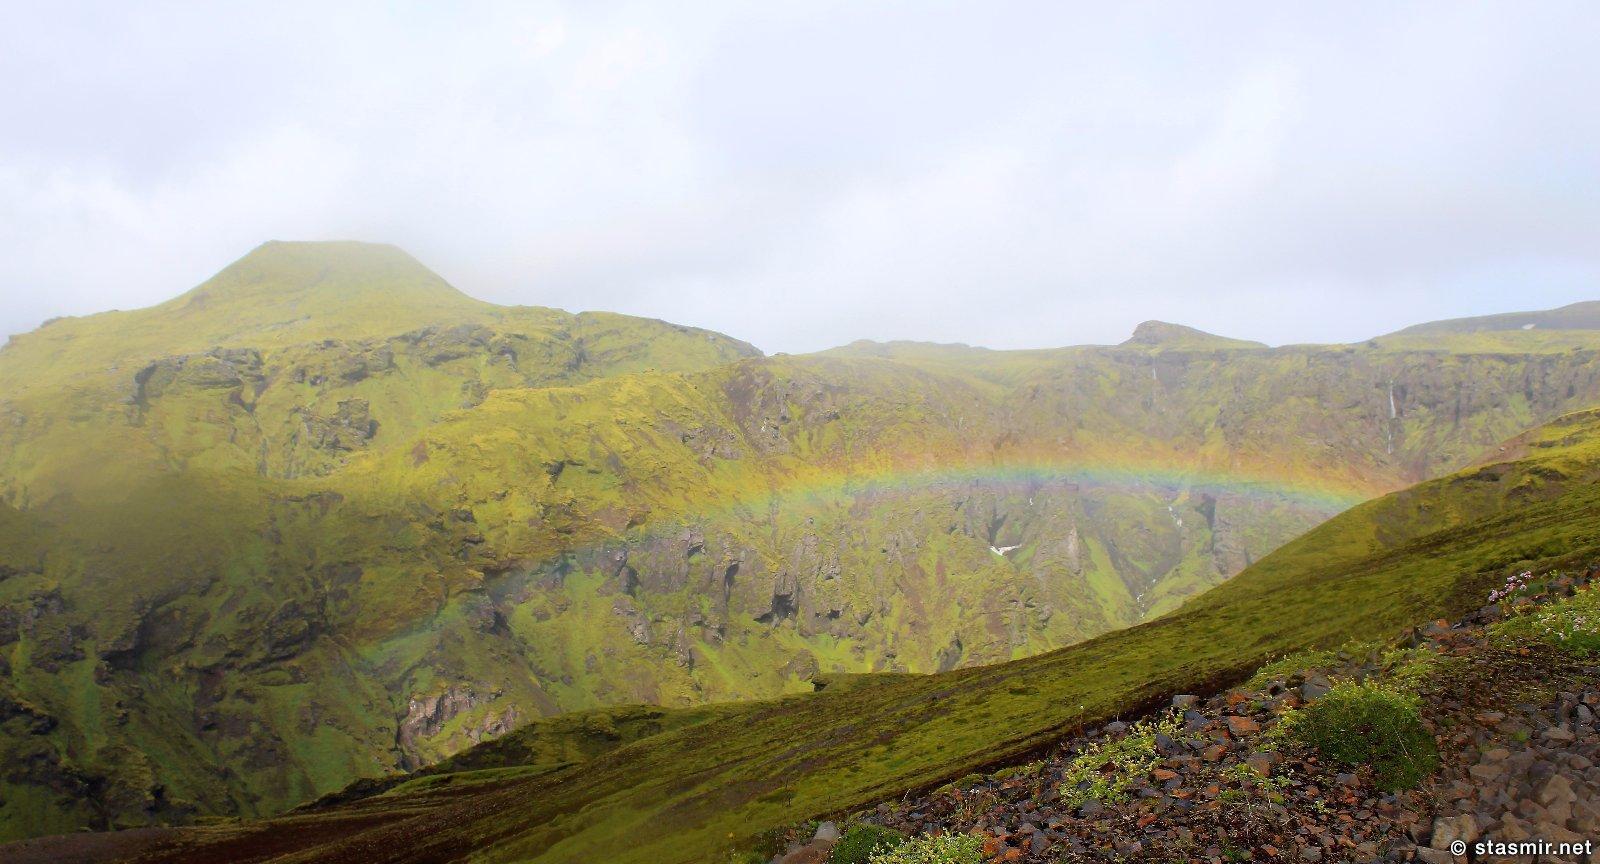 радуга, зеленые луга по маршруту Такгил, Такгиль, Þakgíl, фото Стасмир, photo Stasmir